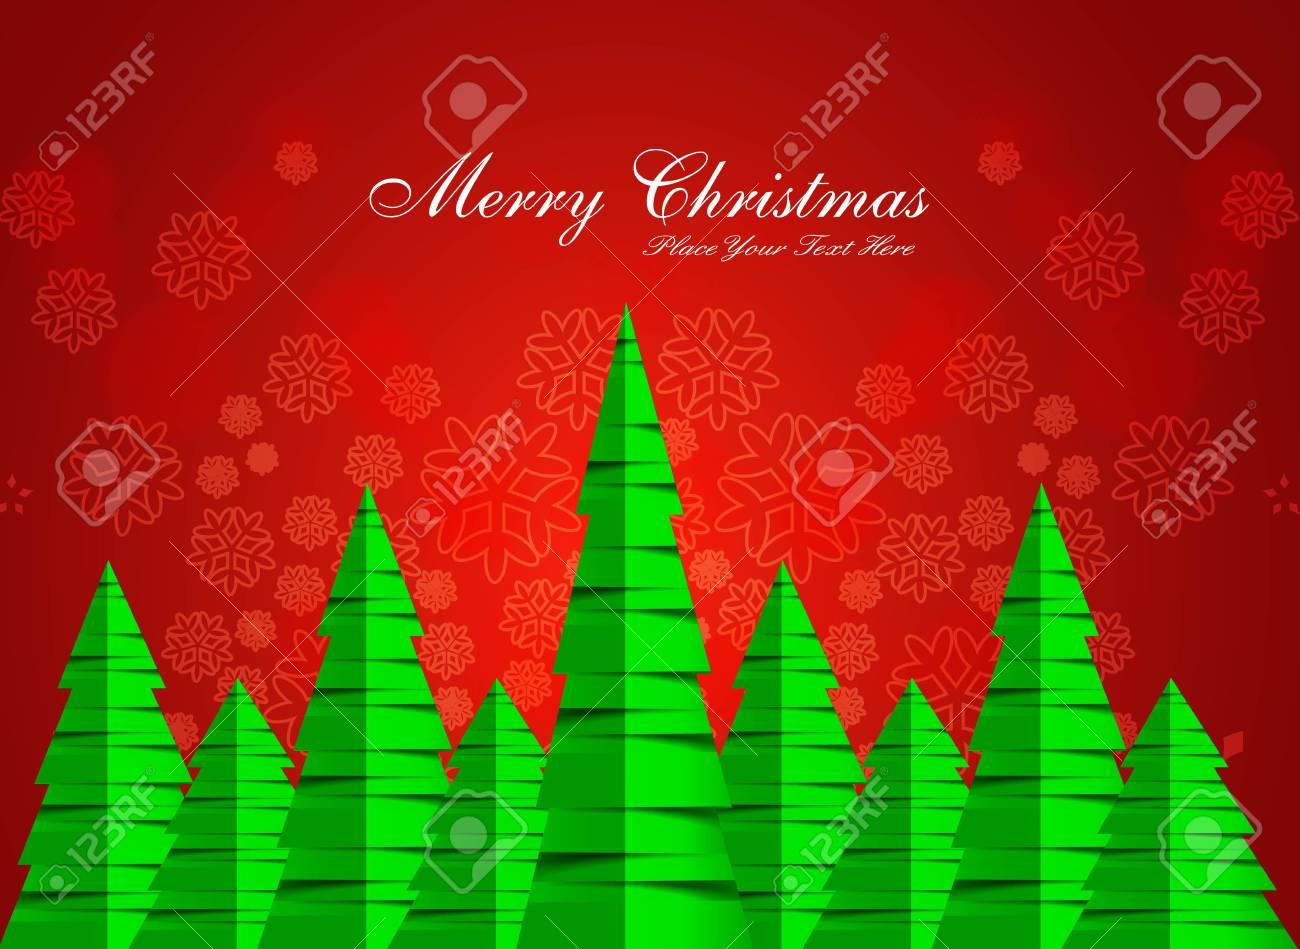 merry christmas stylish green tree background Stock Vector - 17790789